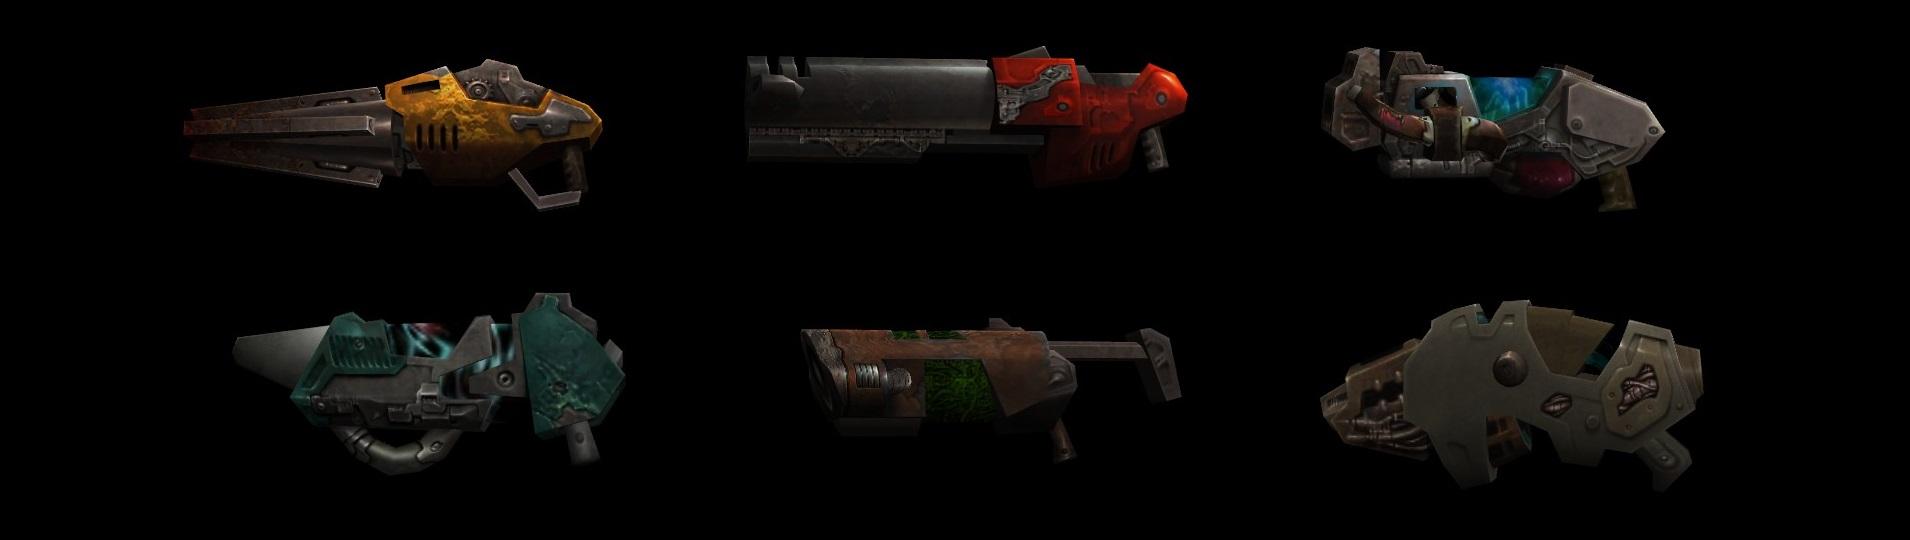 Image - Quake 3 Weapons 2.jpg   QuakeWiki   FANDOM powered ... Quake Vore